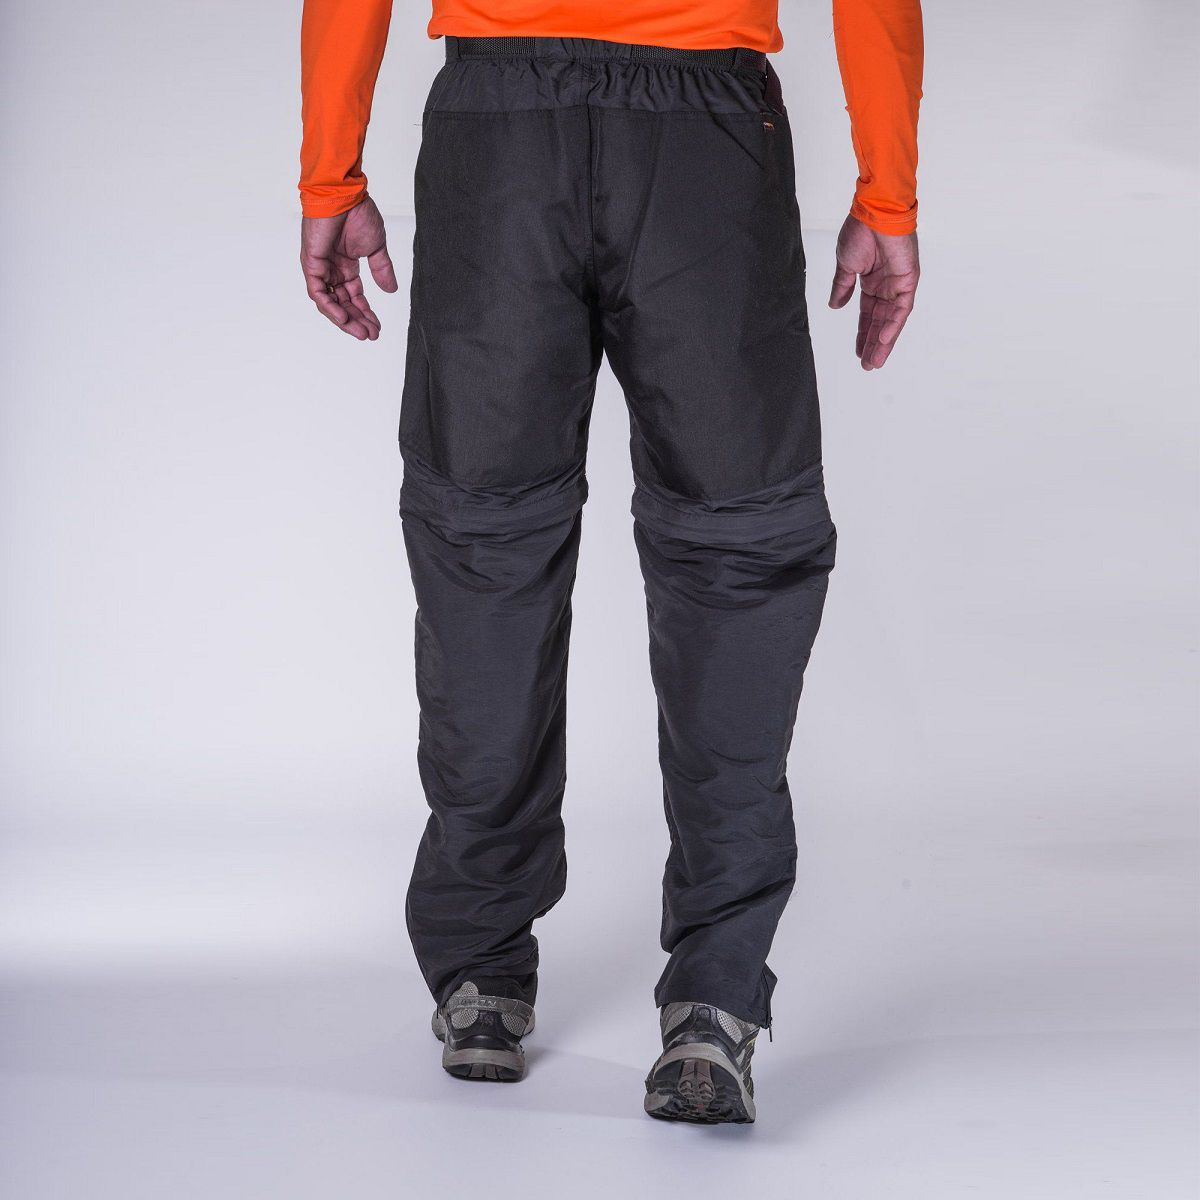 Hard Pro Mountain Masculina Preta - Cordura